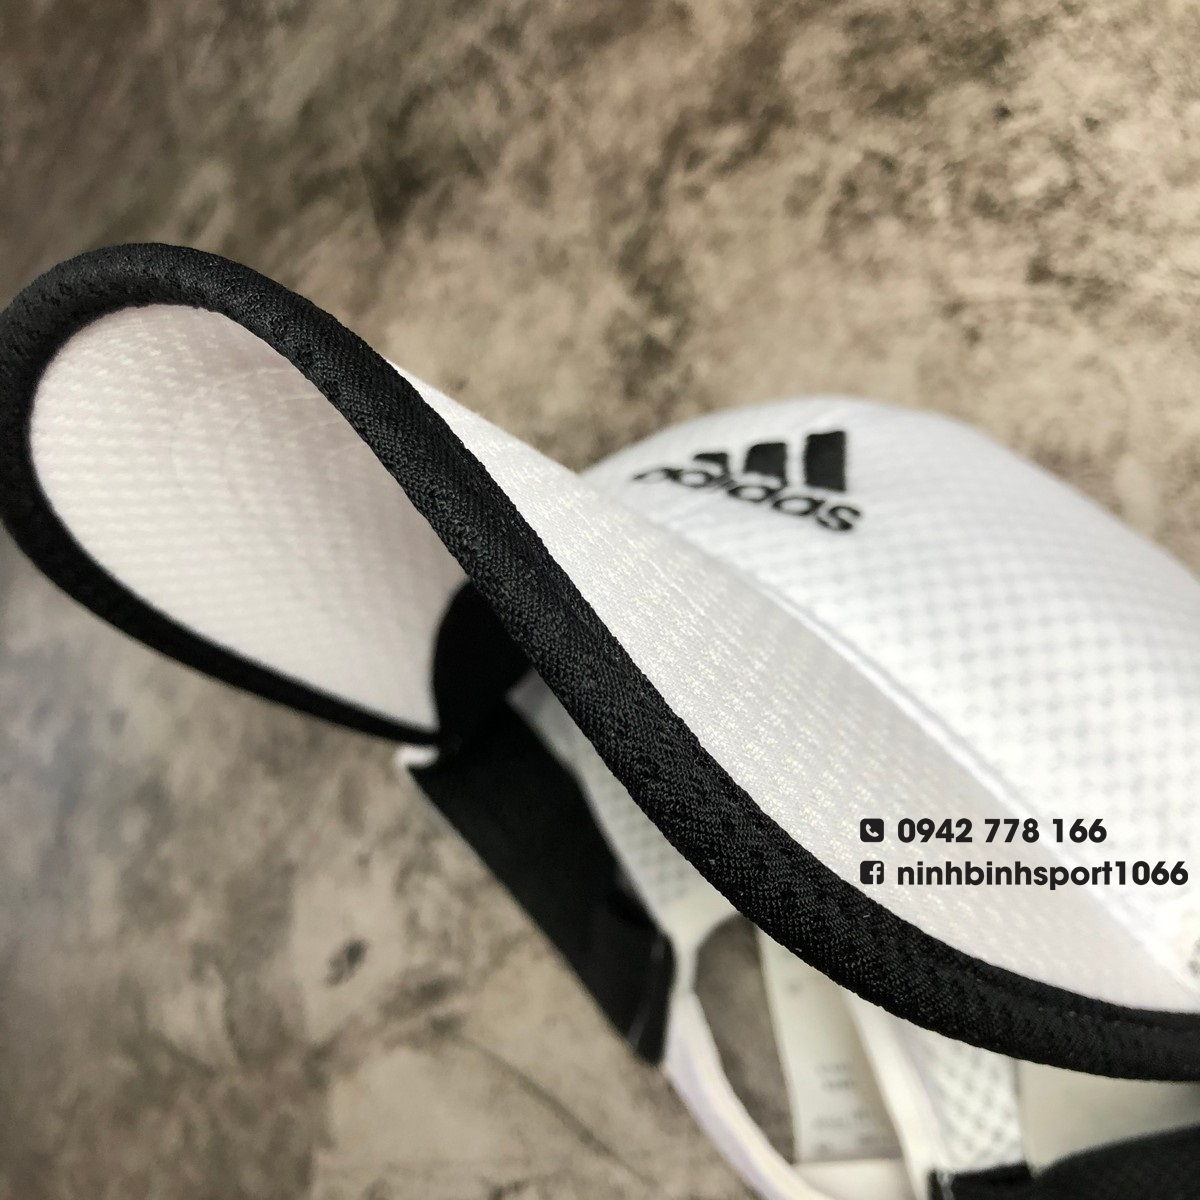 Mũ thể thao Adidas 517-06-OSFX